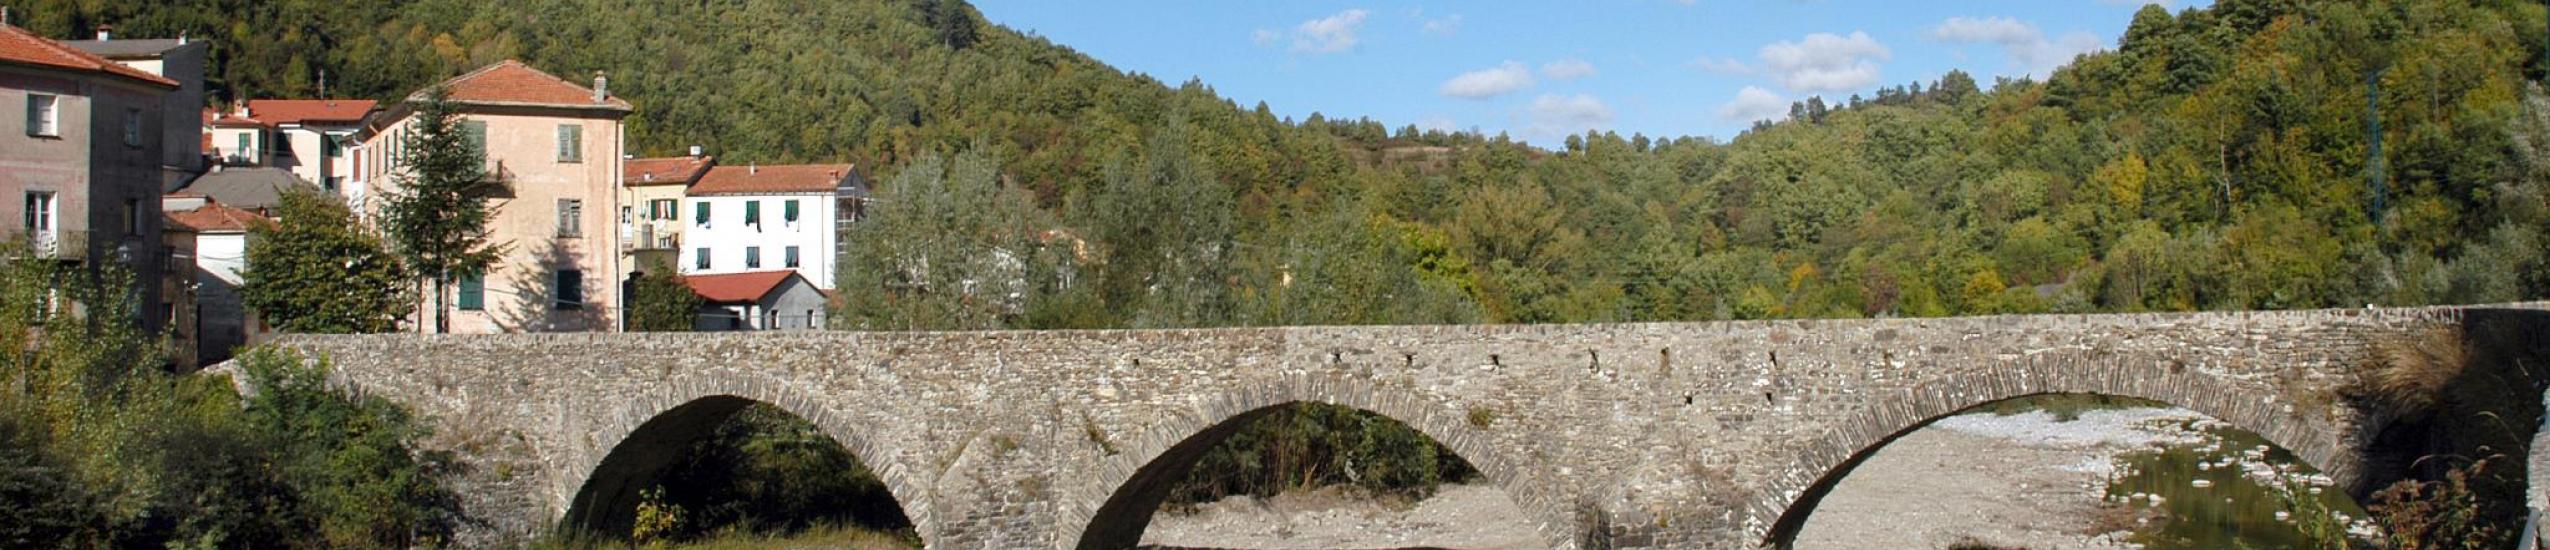 ponte medievale di Montebruno